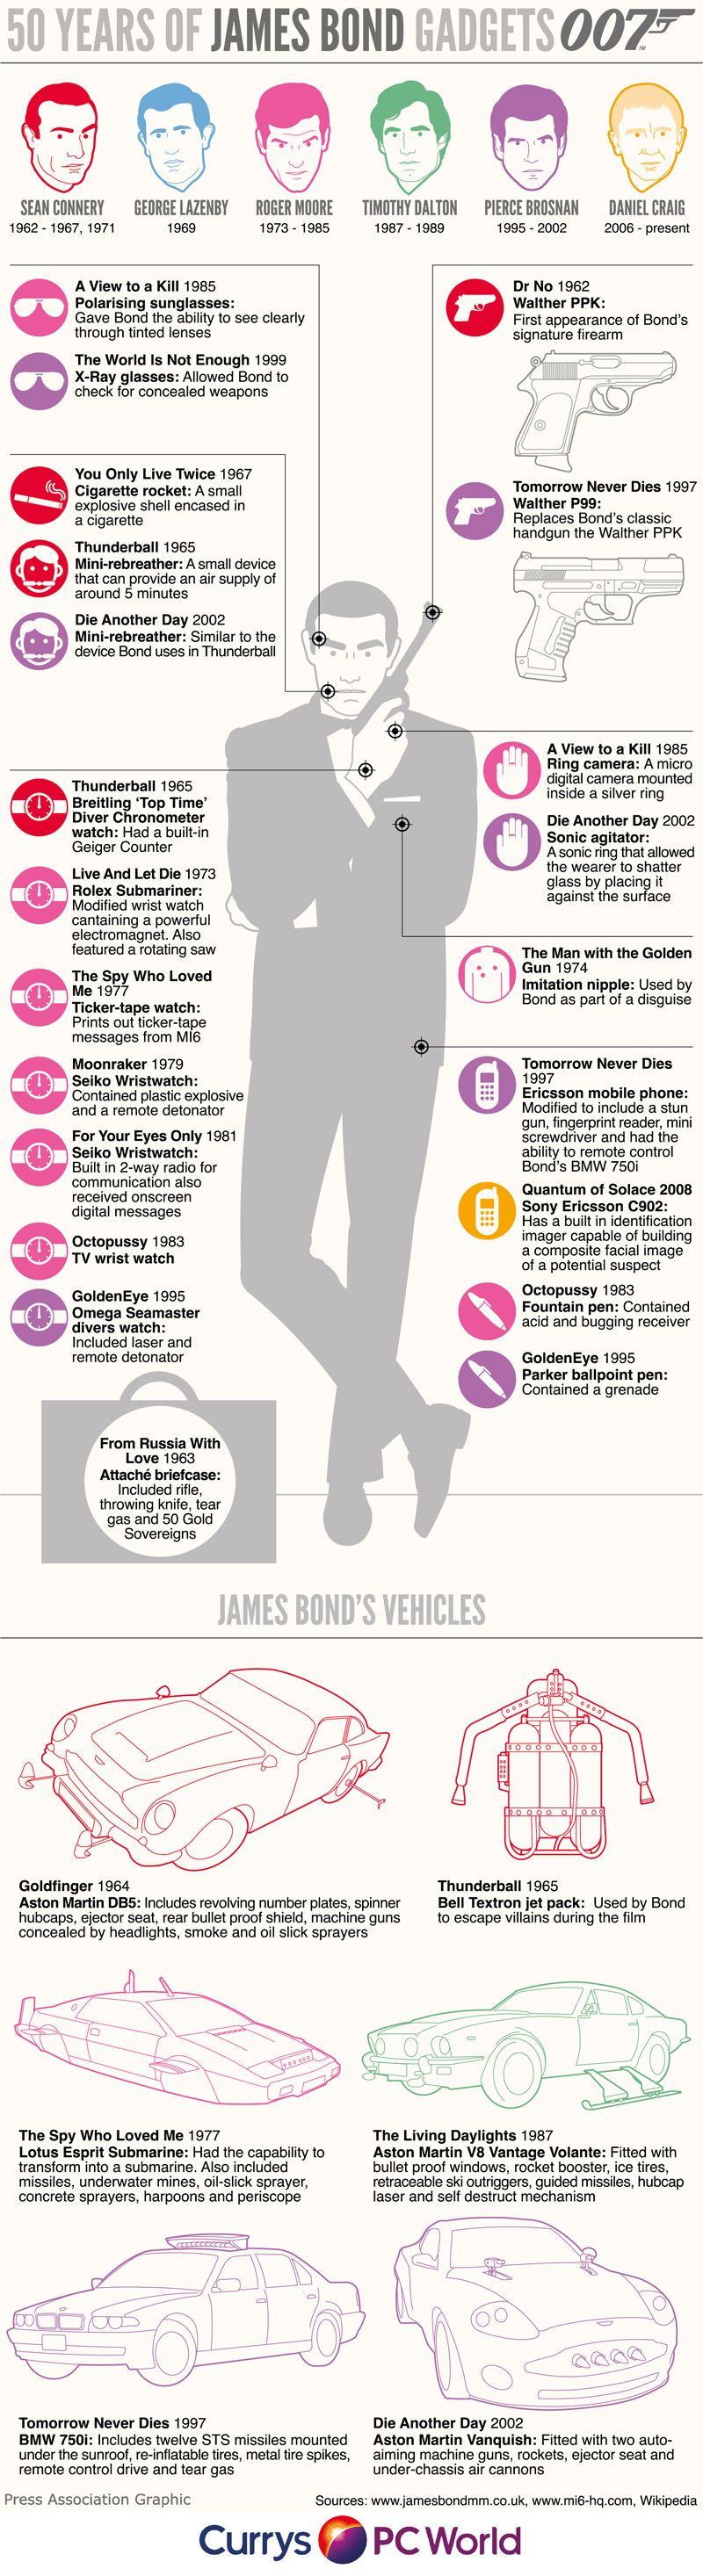 James Bond gadgets | INFOGRAPHIC: 50 years of James Bond gadgets